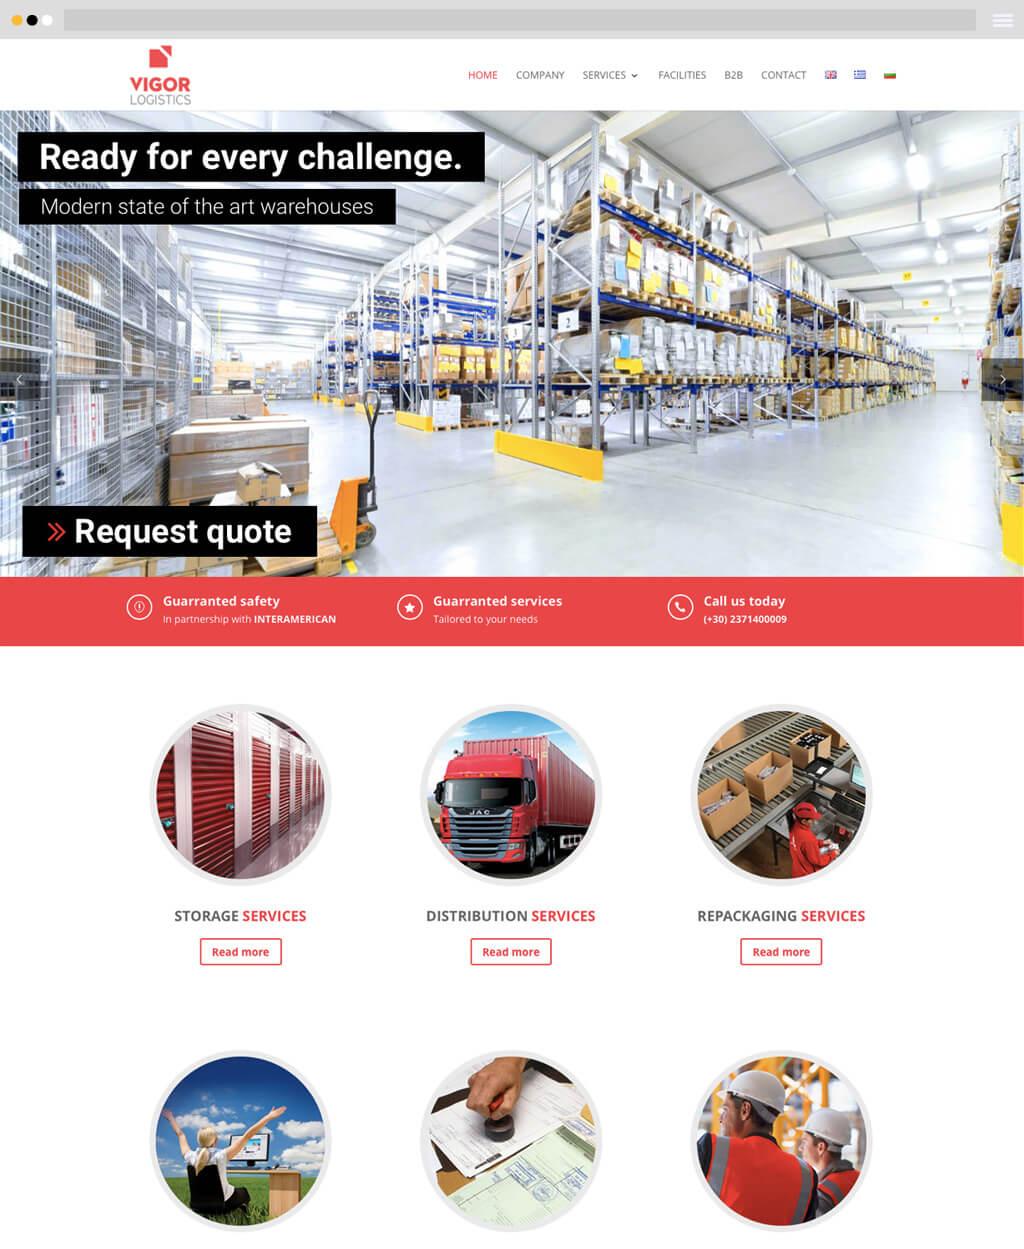 vigor logistics website design frontpage